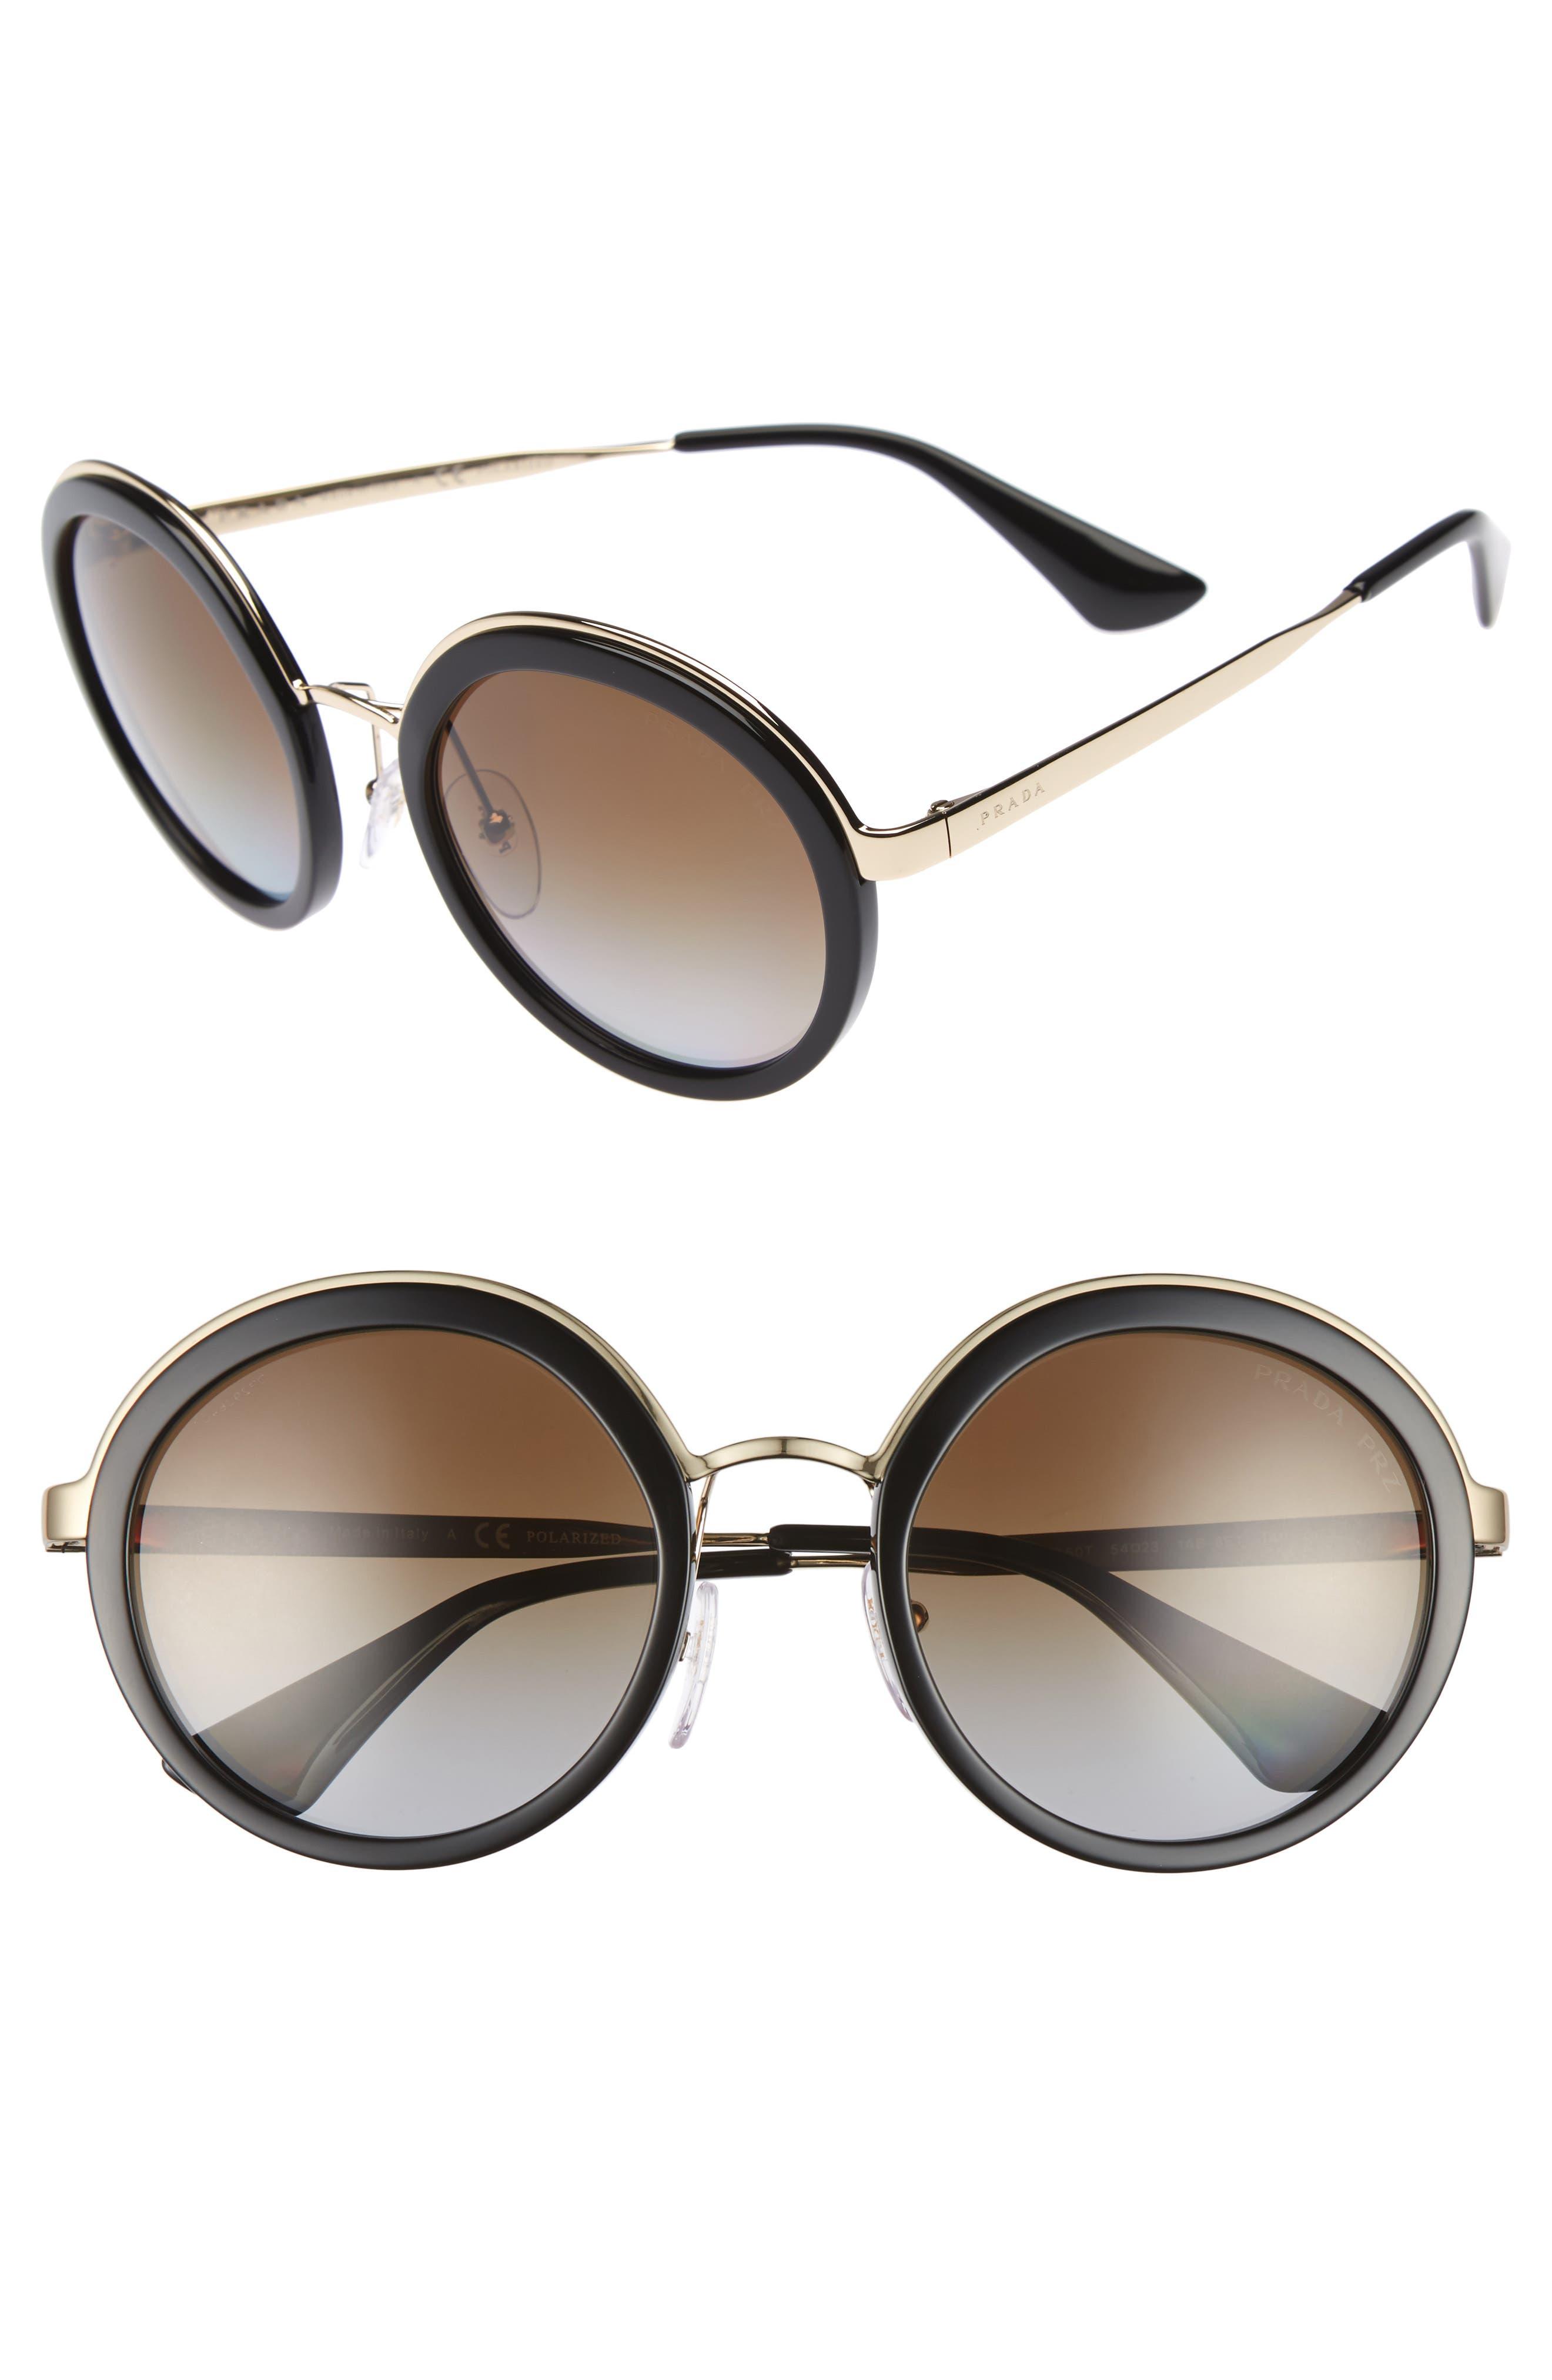 Prada 54mm Polarized Round Sunglasses